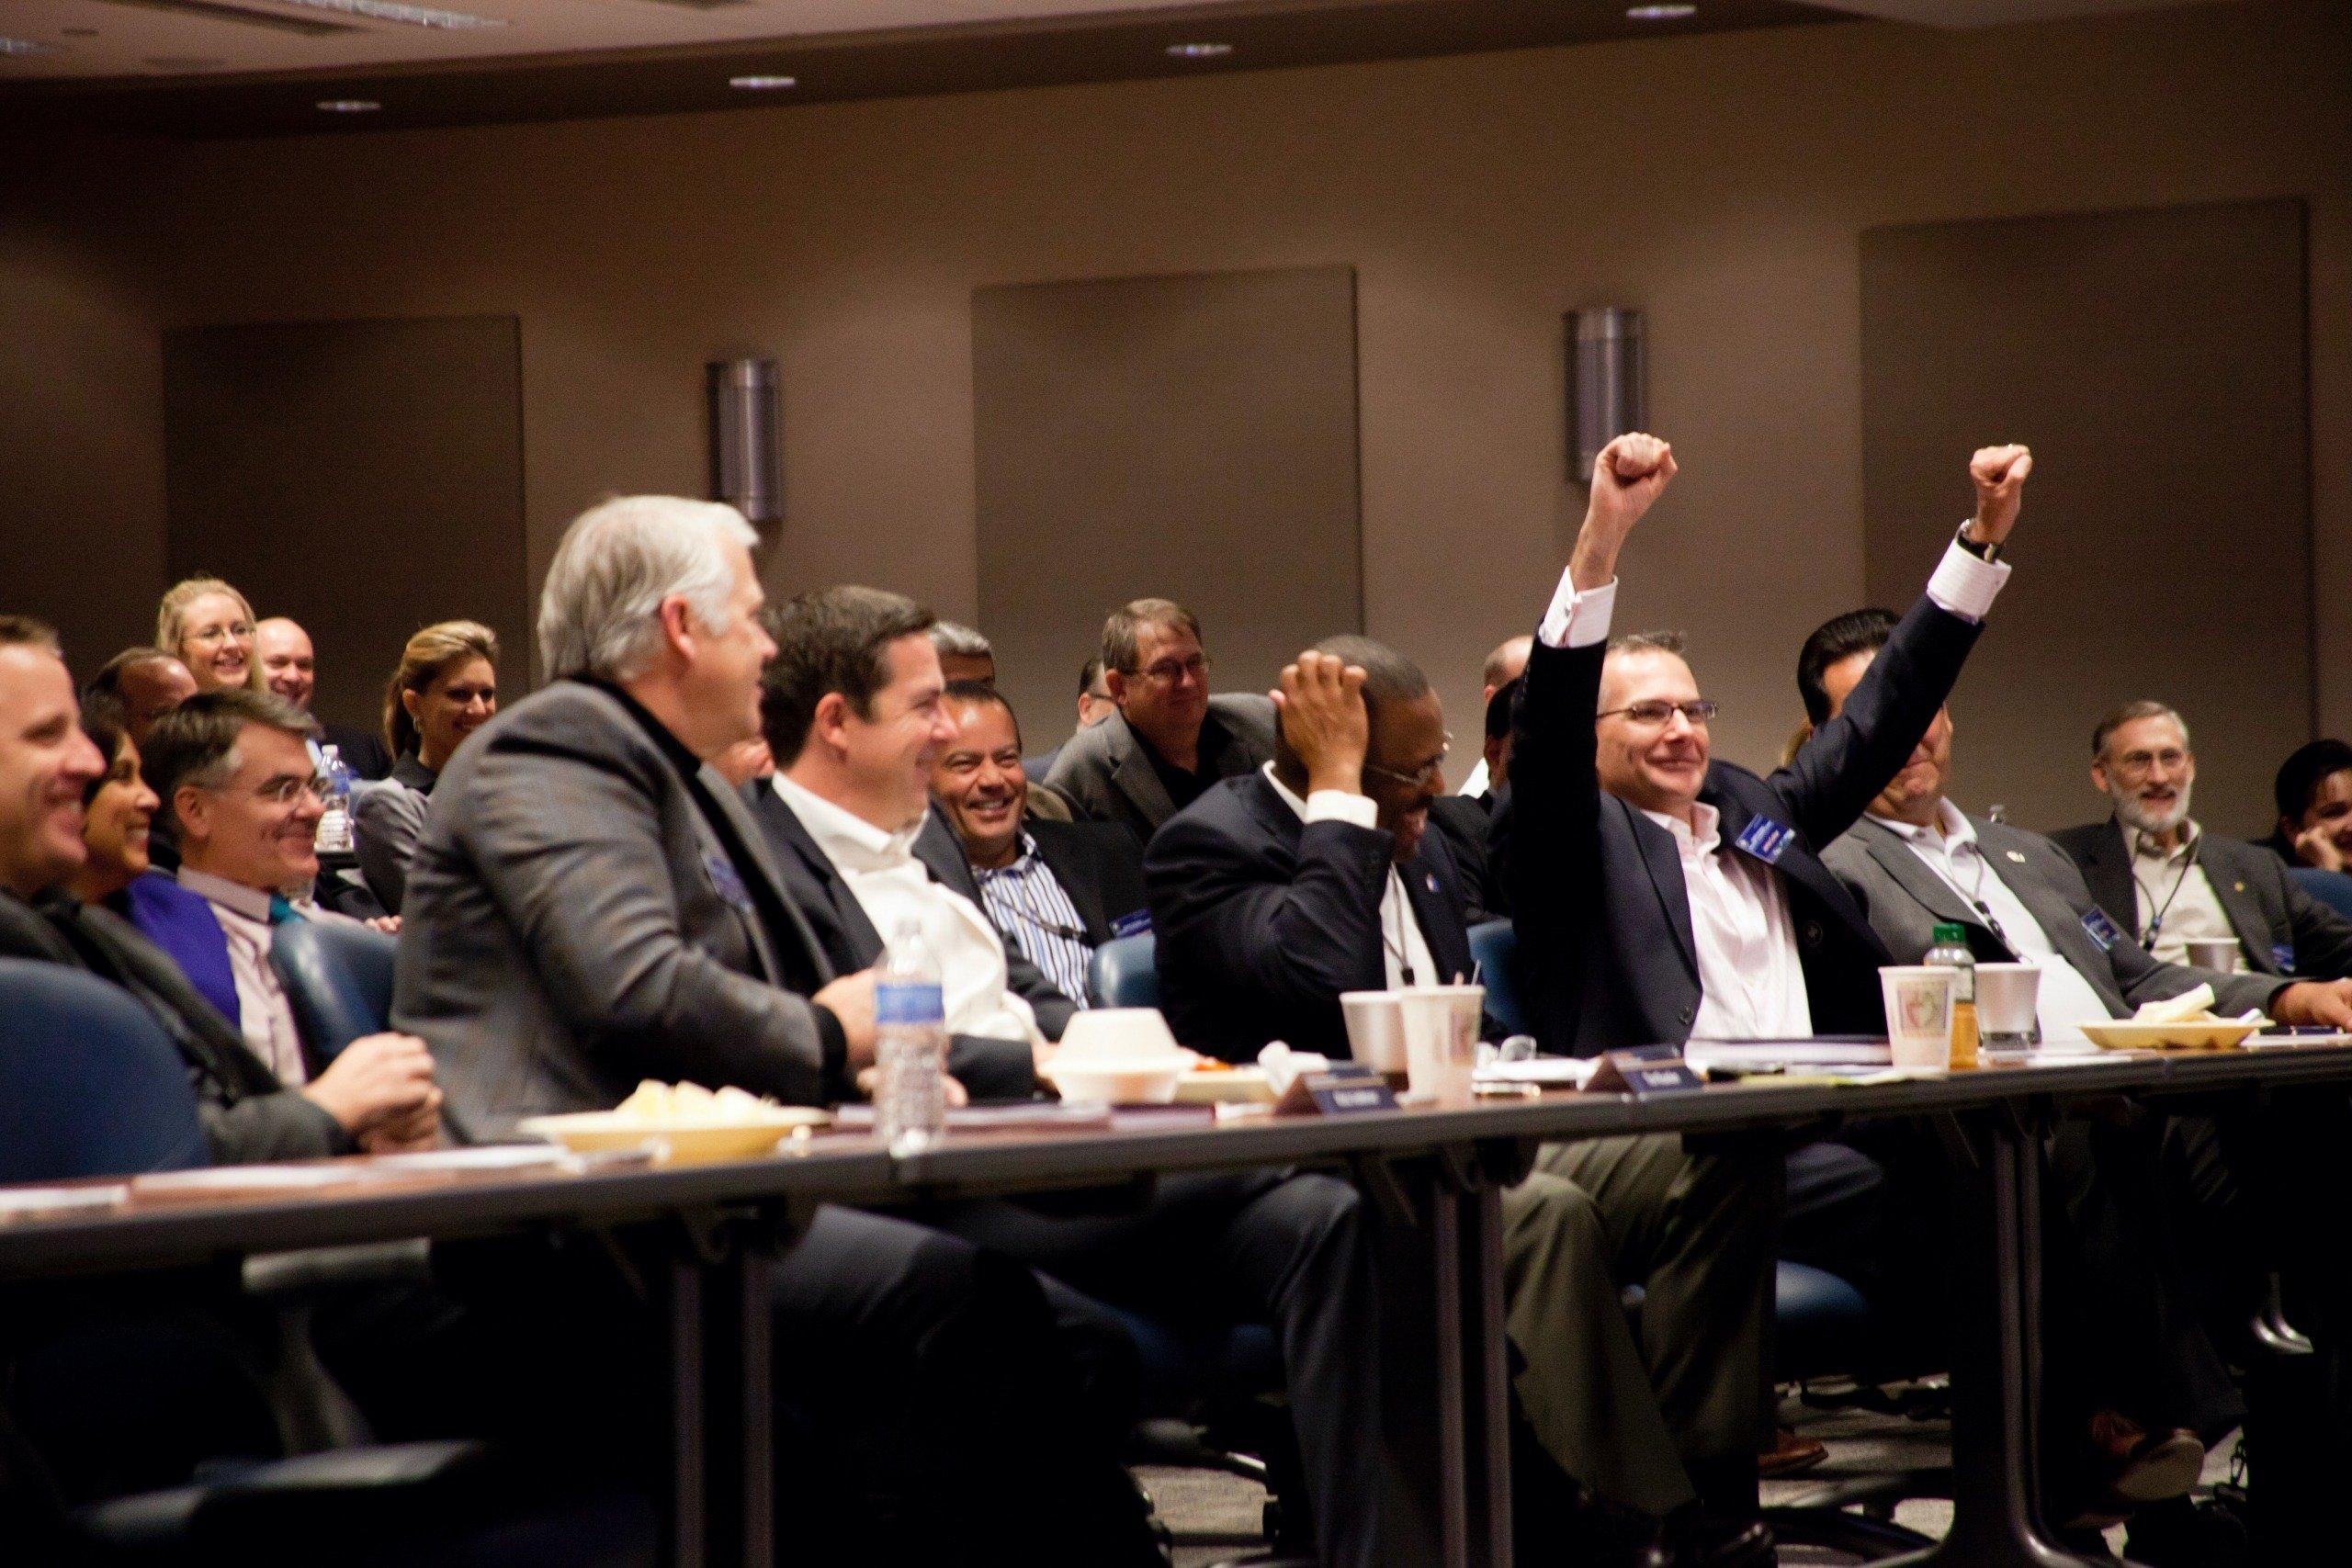 men in the audience of funny motivational speaker